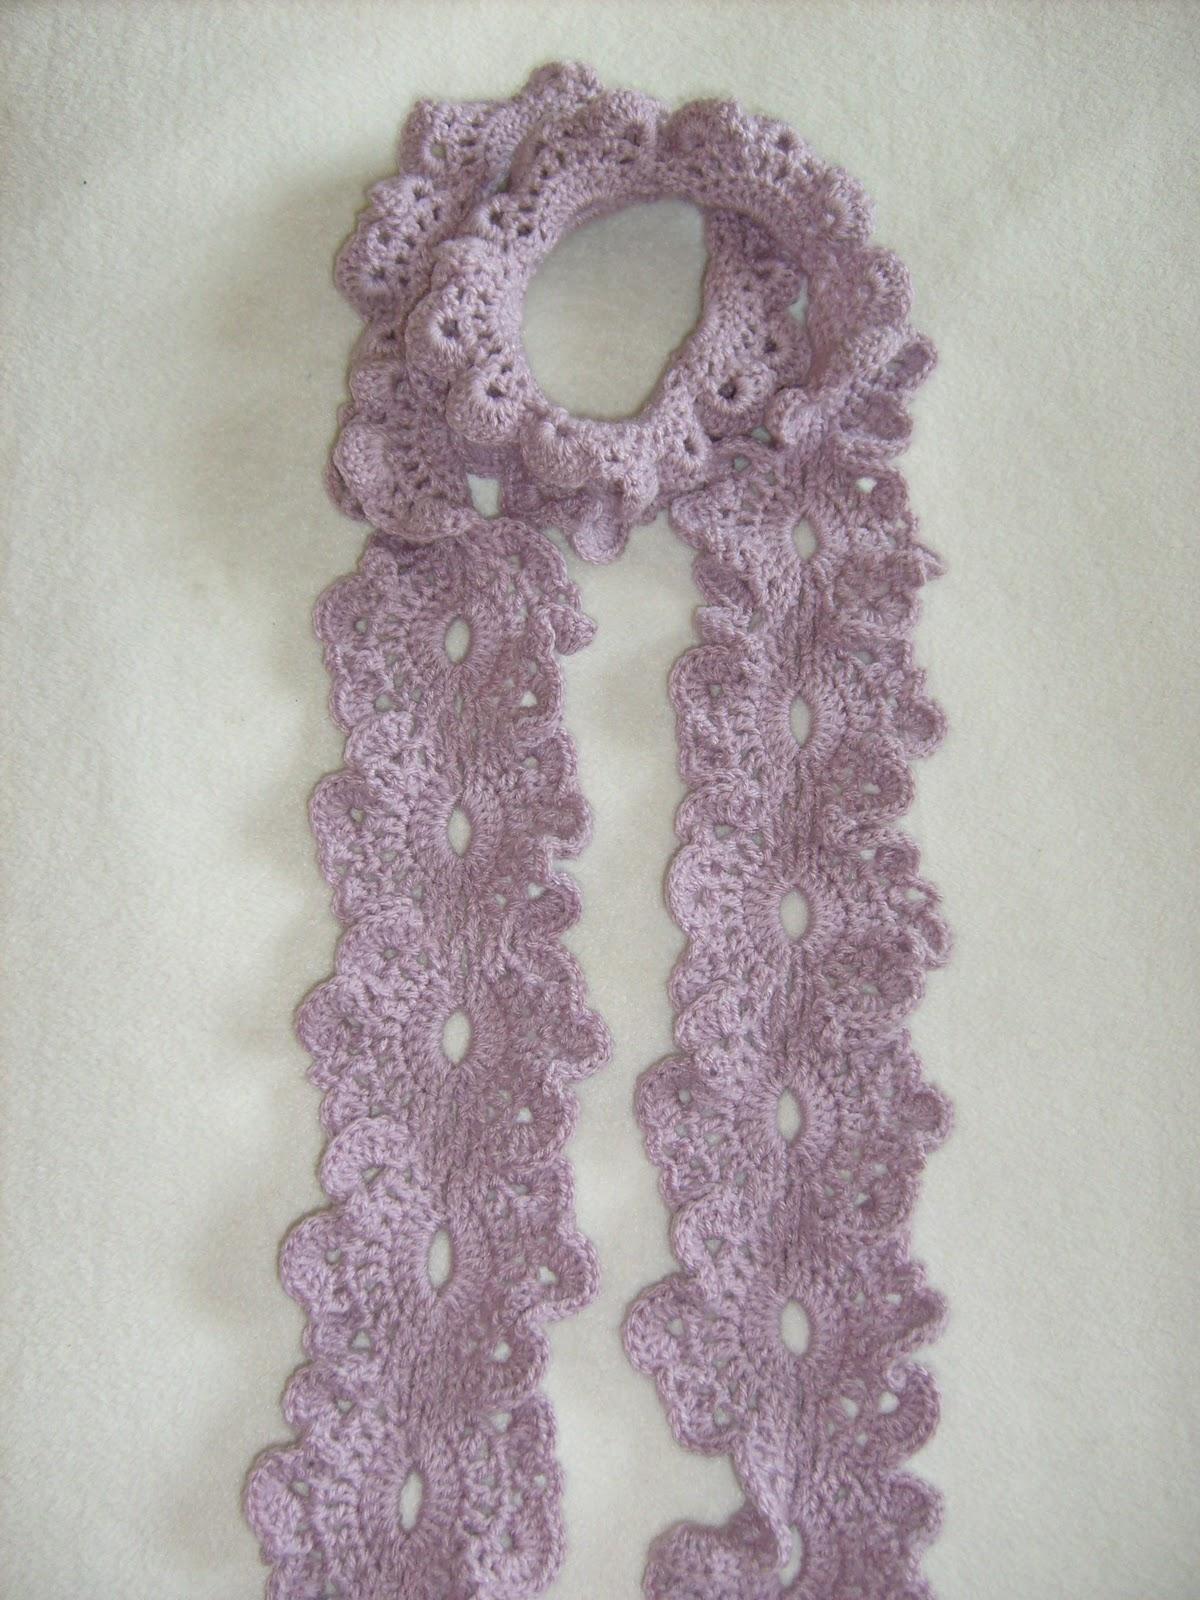 Bufandas tejidas a mano- crochet flower scarf handmade - Chicago